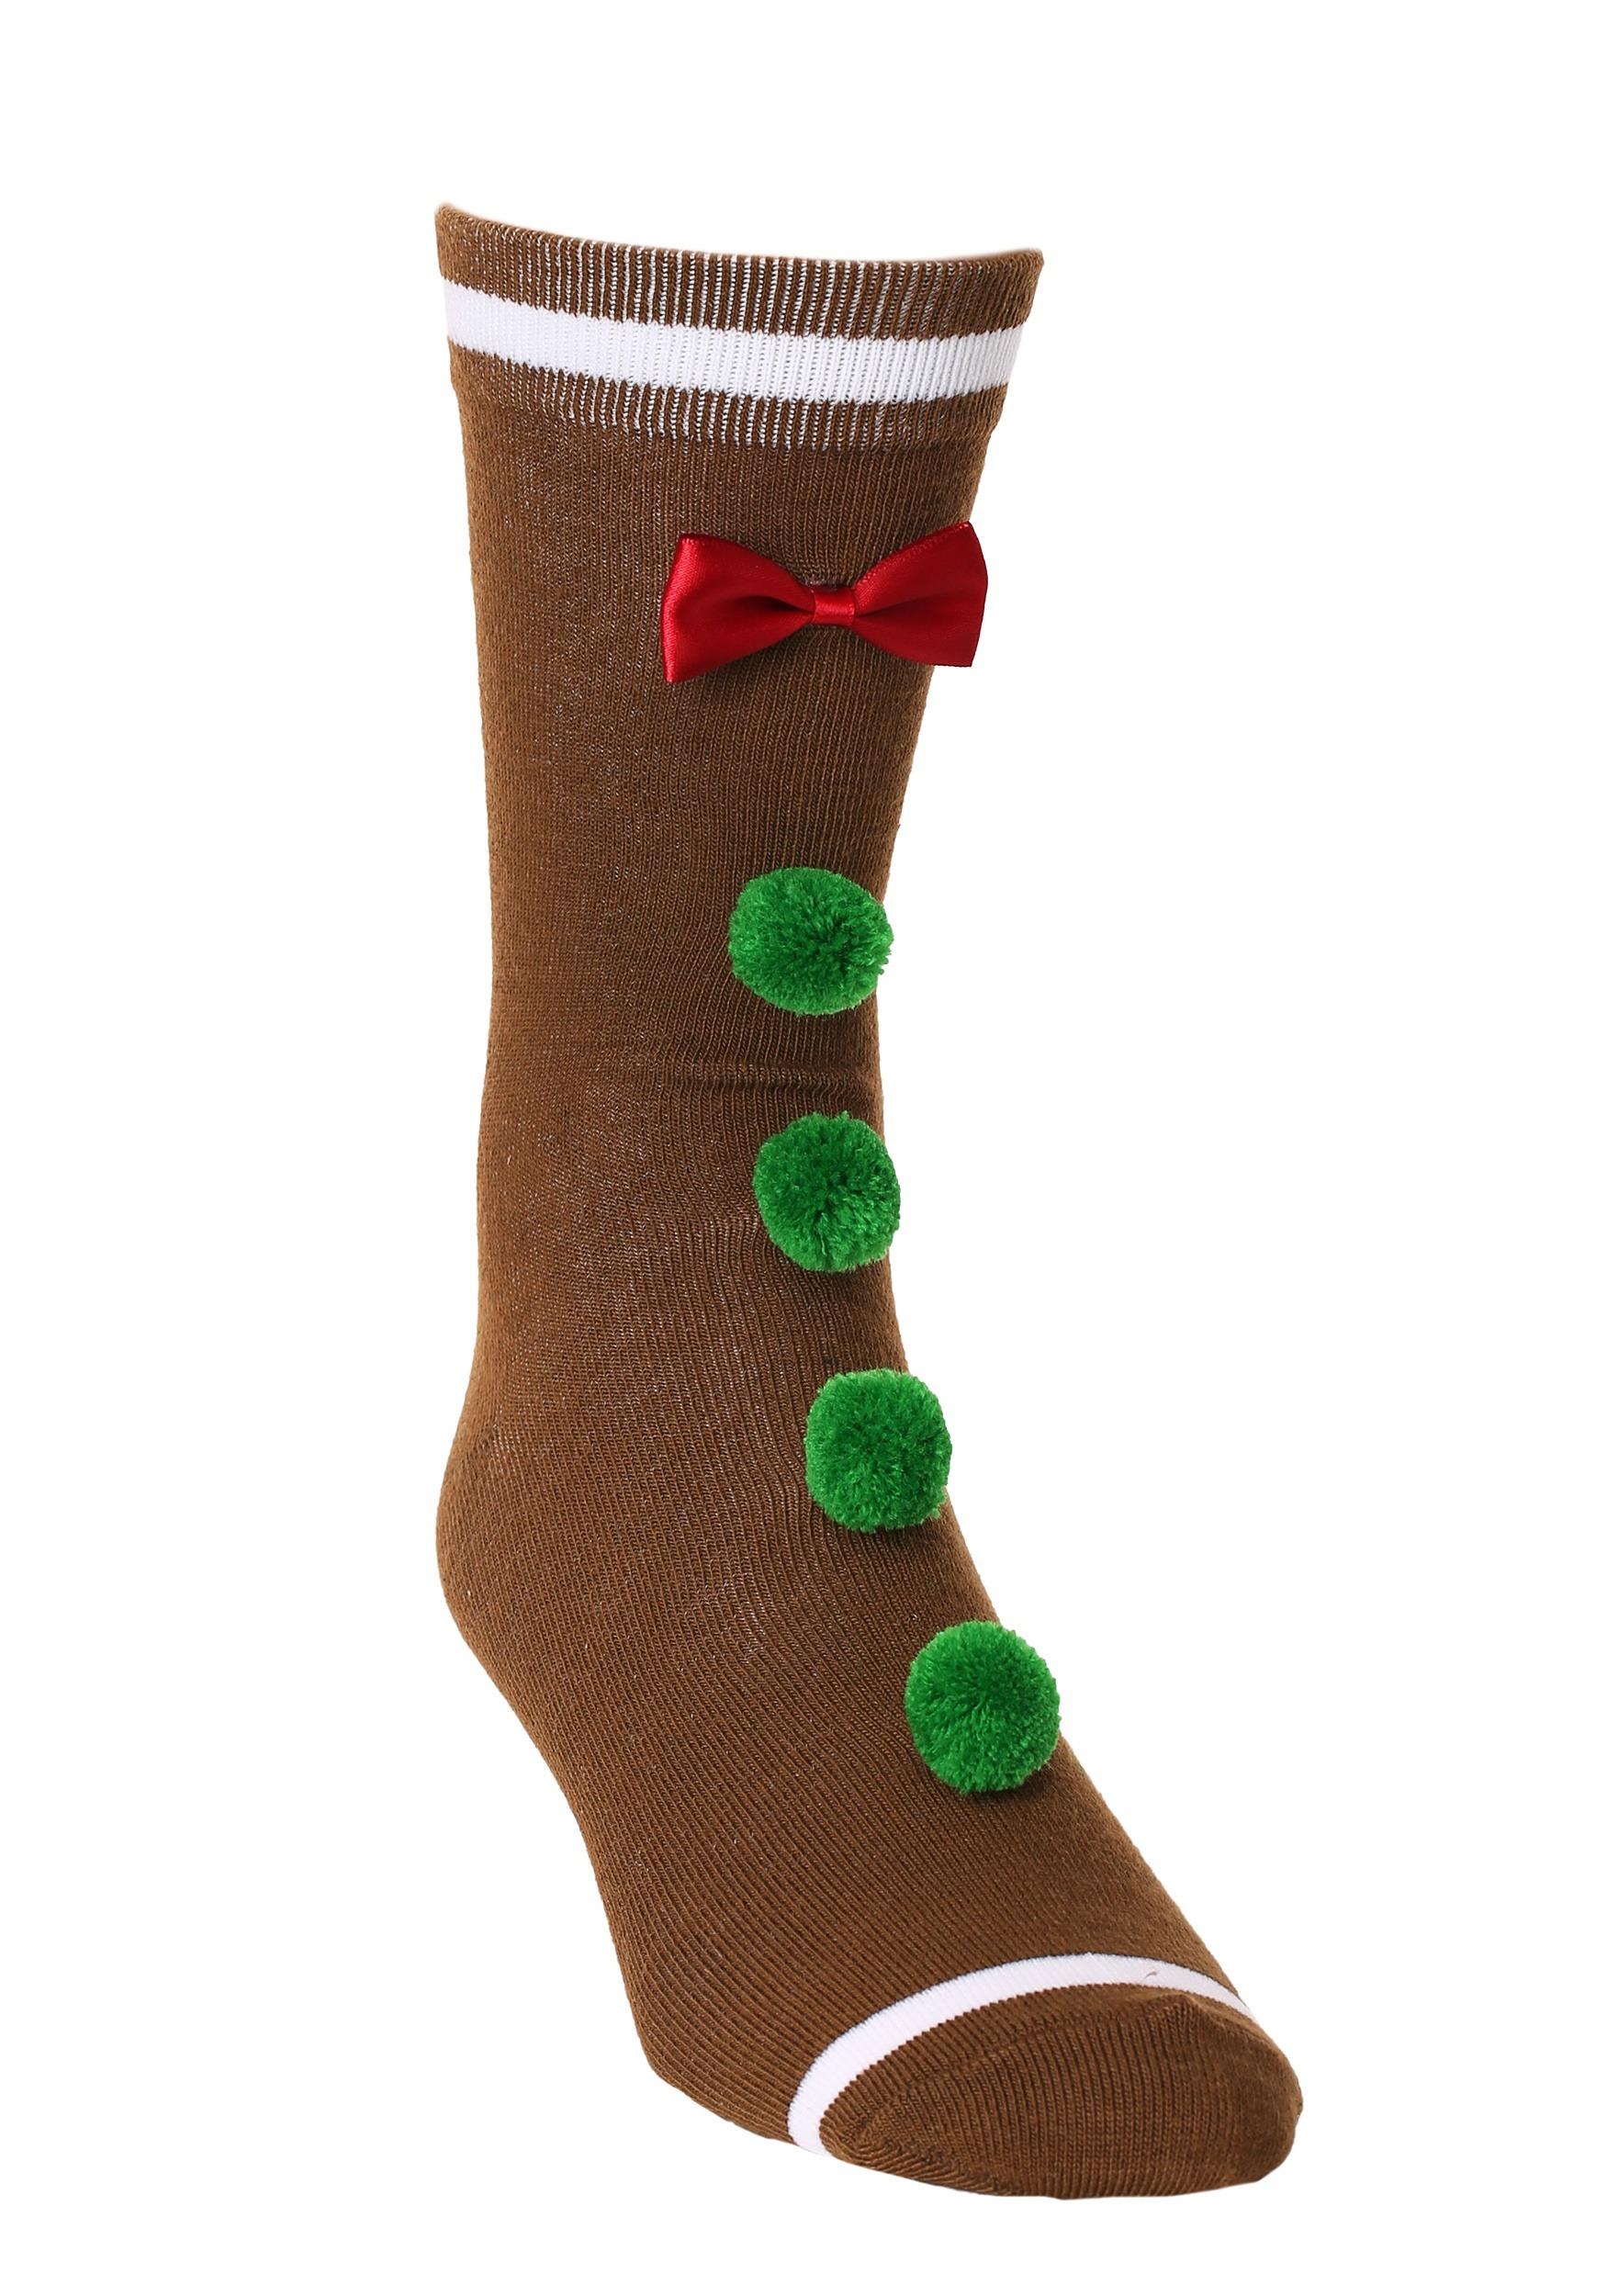 Novelty 3D Gingerbread Man Crew Socks